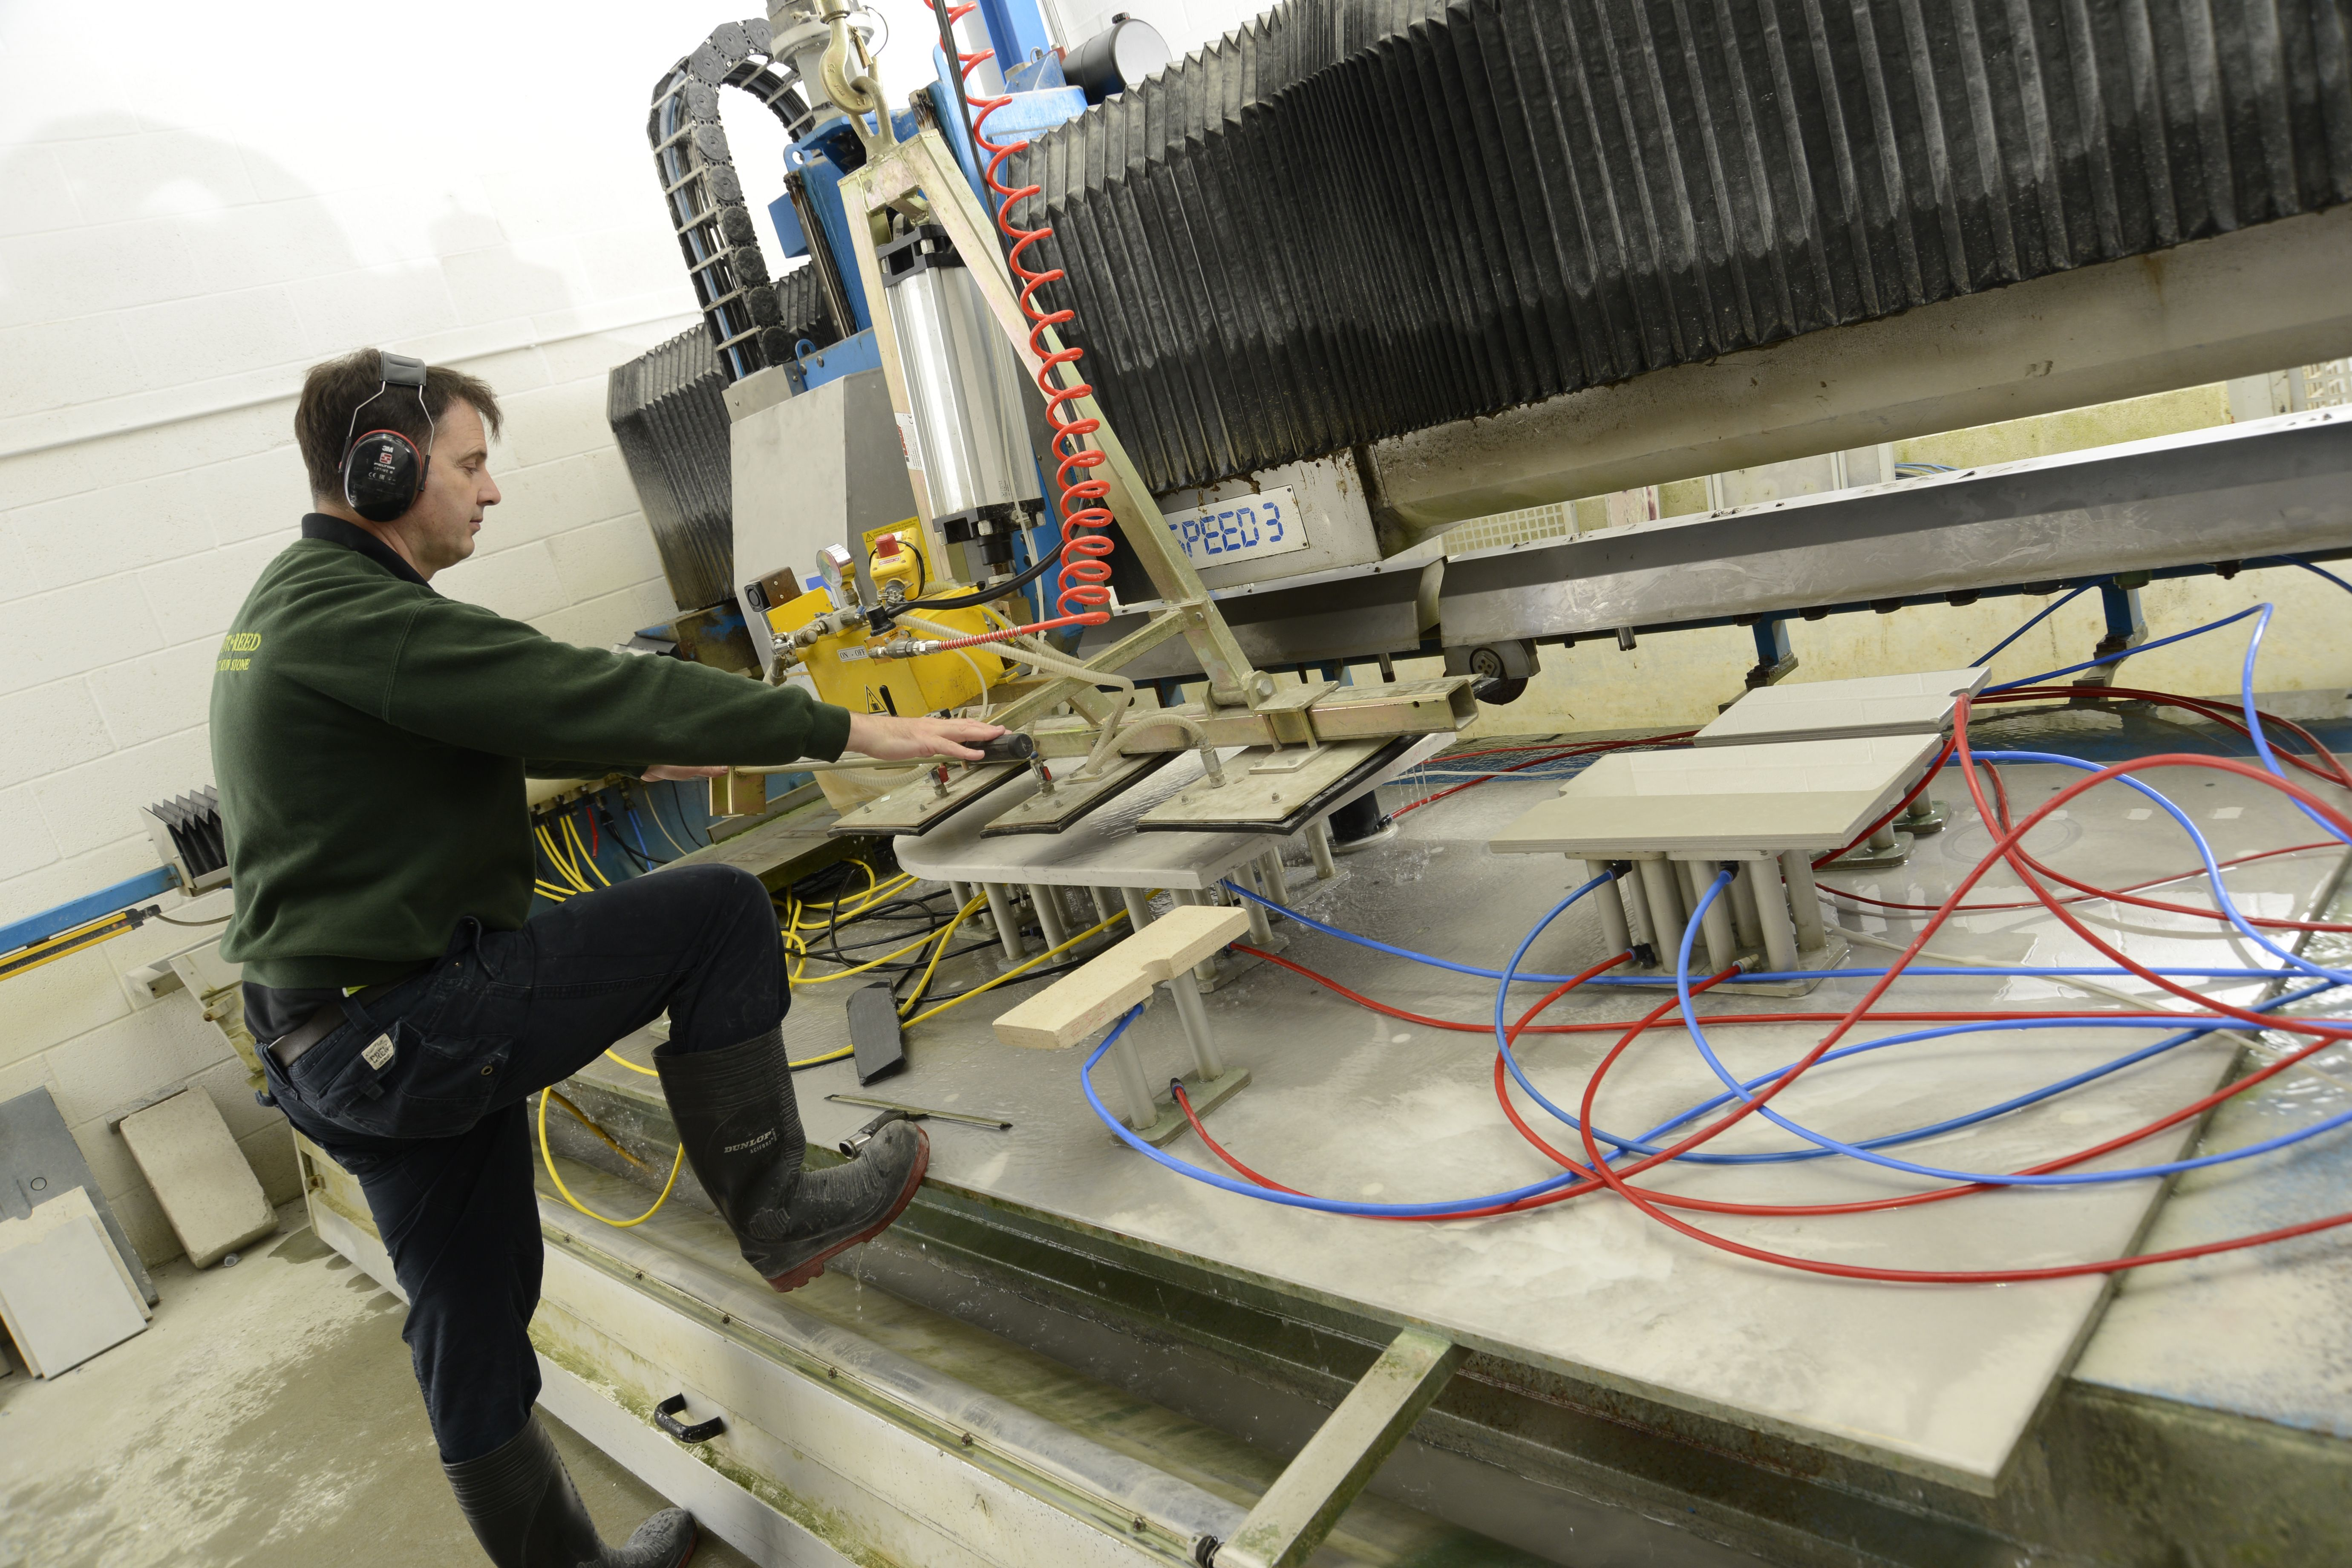 Ivett Reed Workshop Brembana Speed 3 Cnc Machine Multi Fuel Stove Cnc Machine Granite Worktops